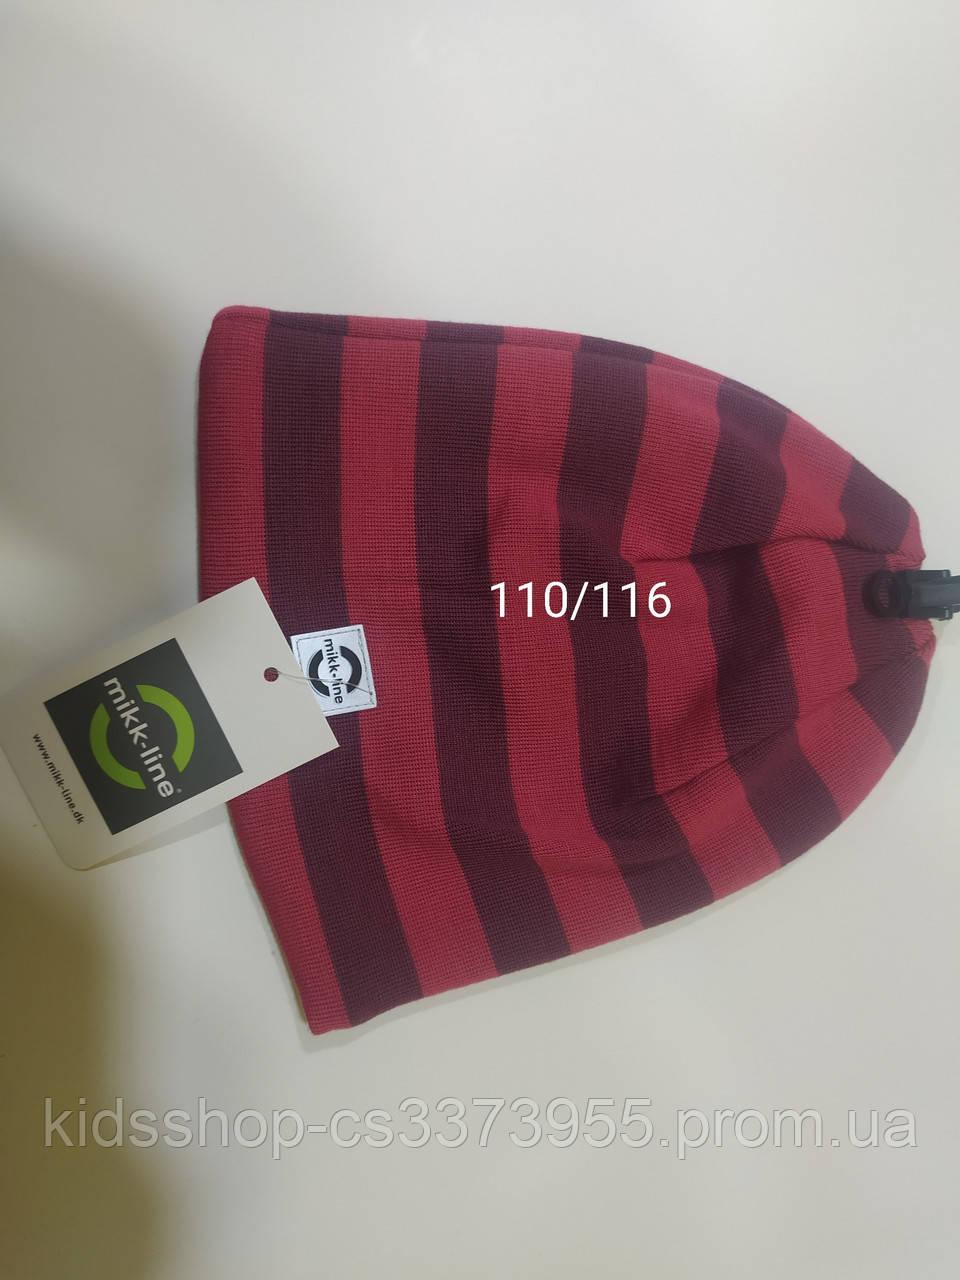 Шапка осень-зима детская размер 110/116